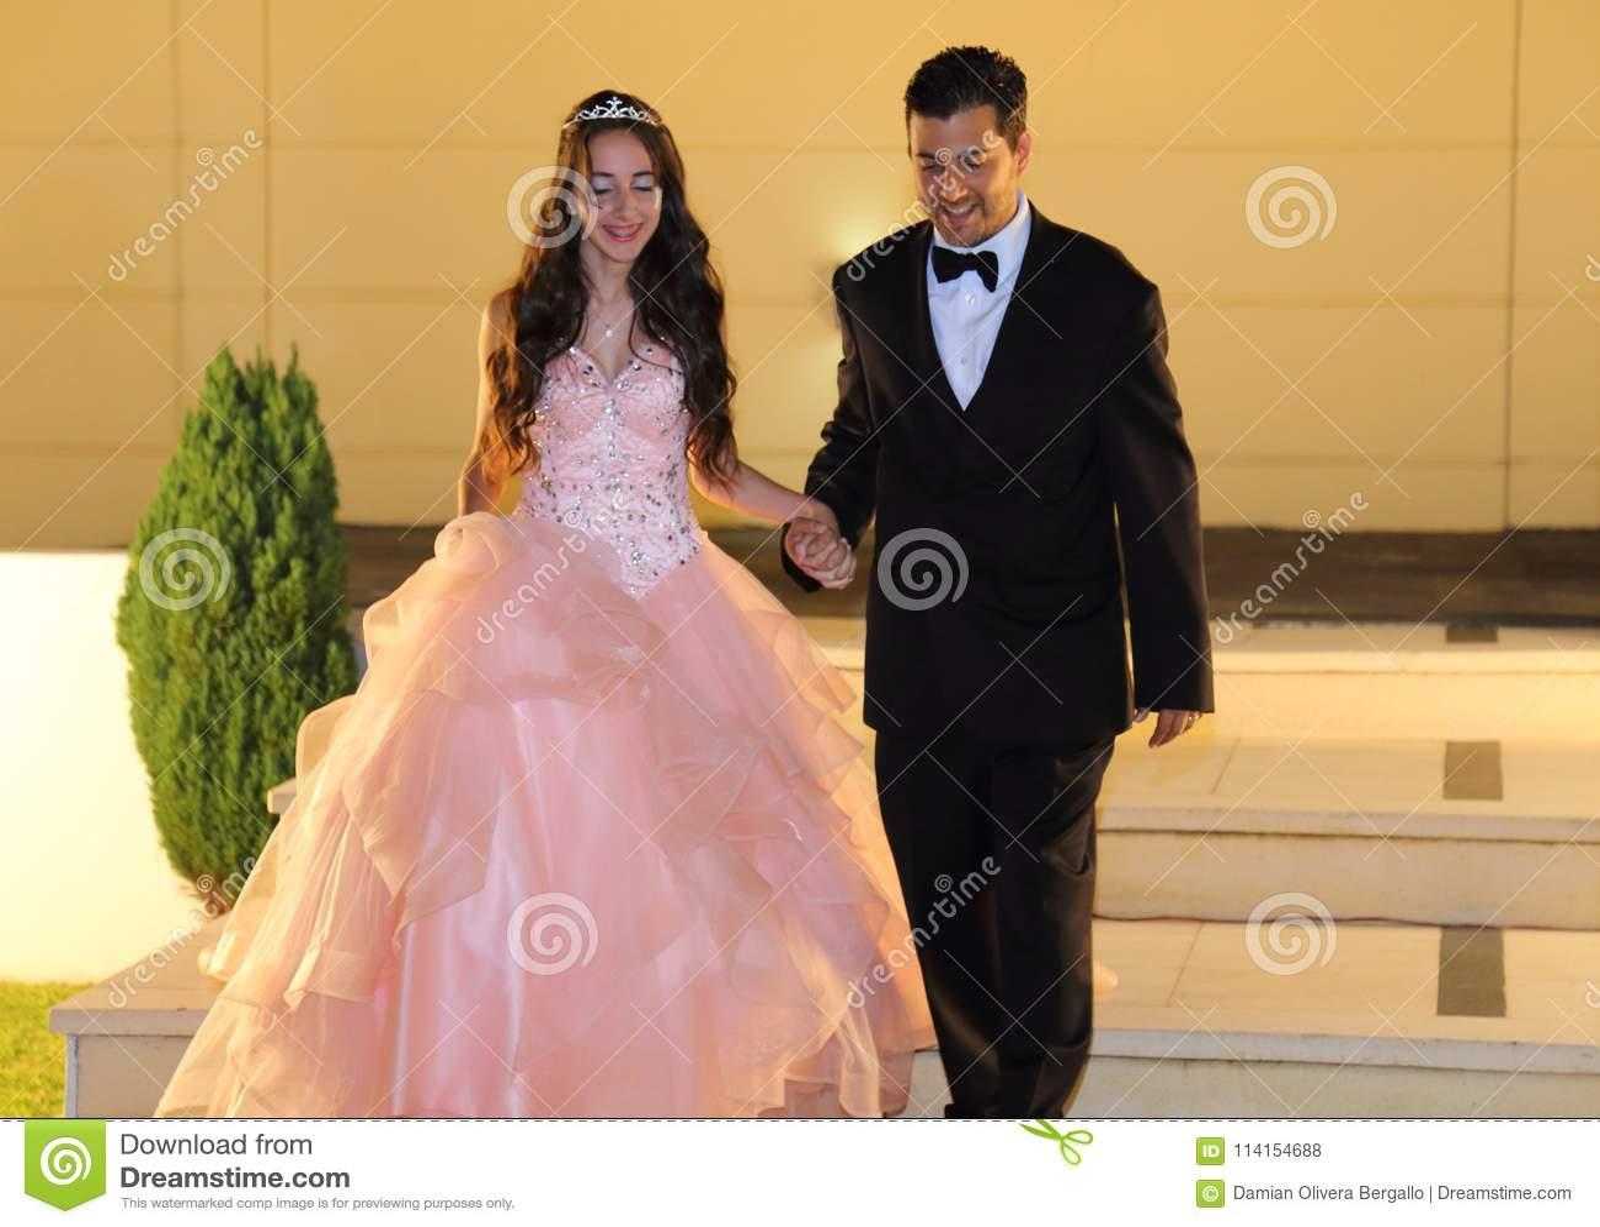 Teen Birthday Party Dress